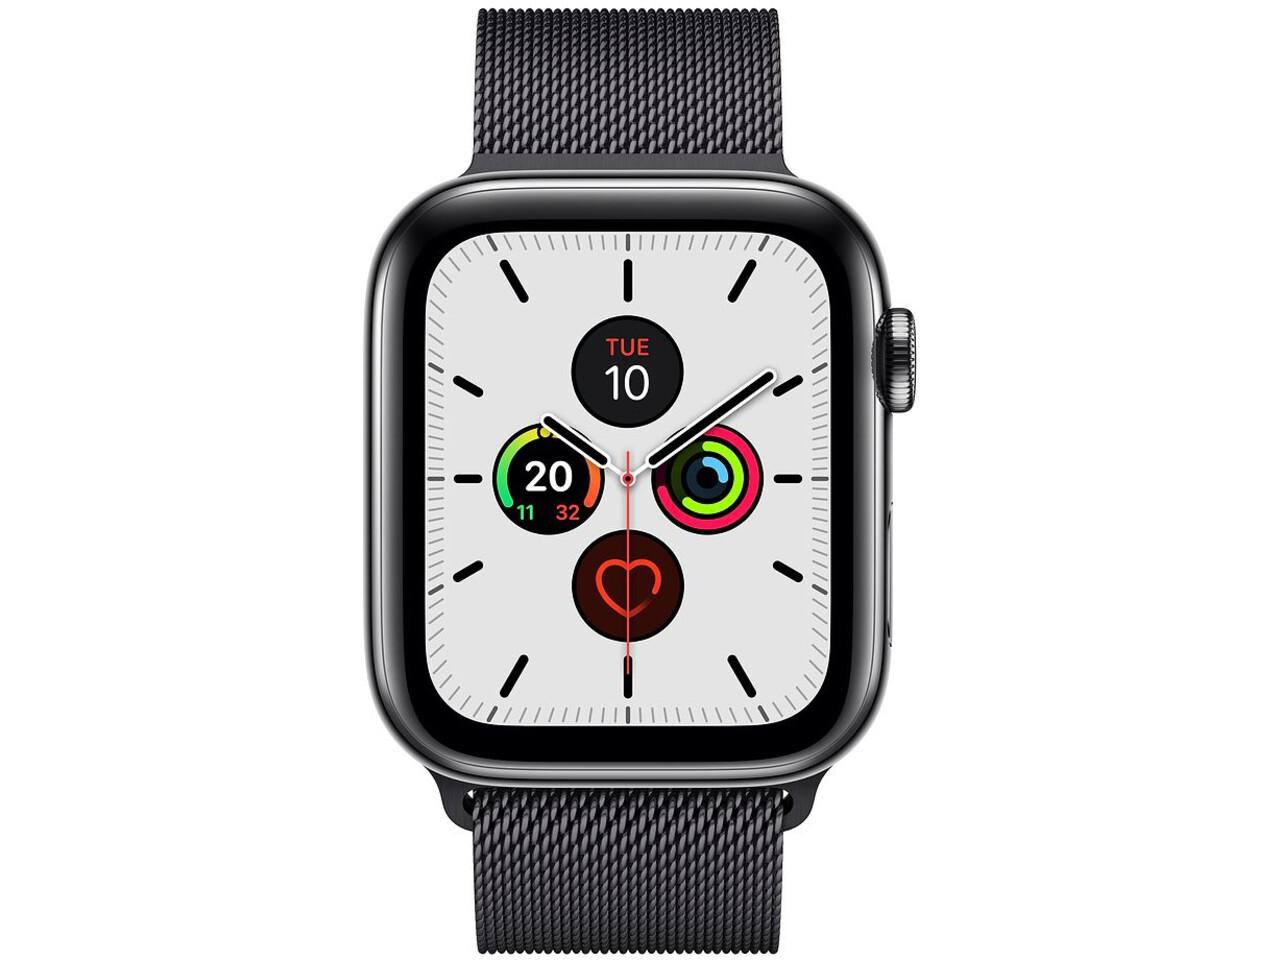 apple watch series 5 cellular 44mm space black stainless steel space black stainless steel